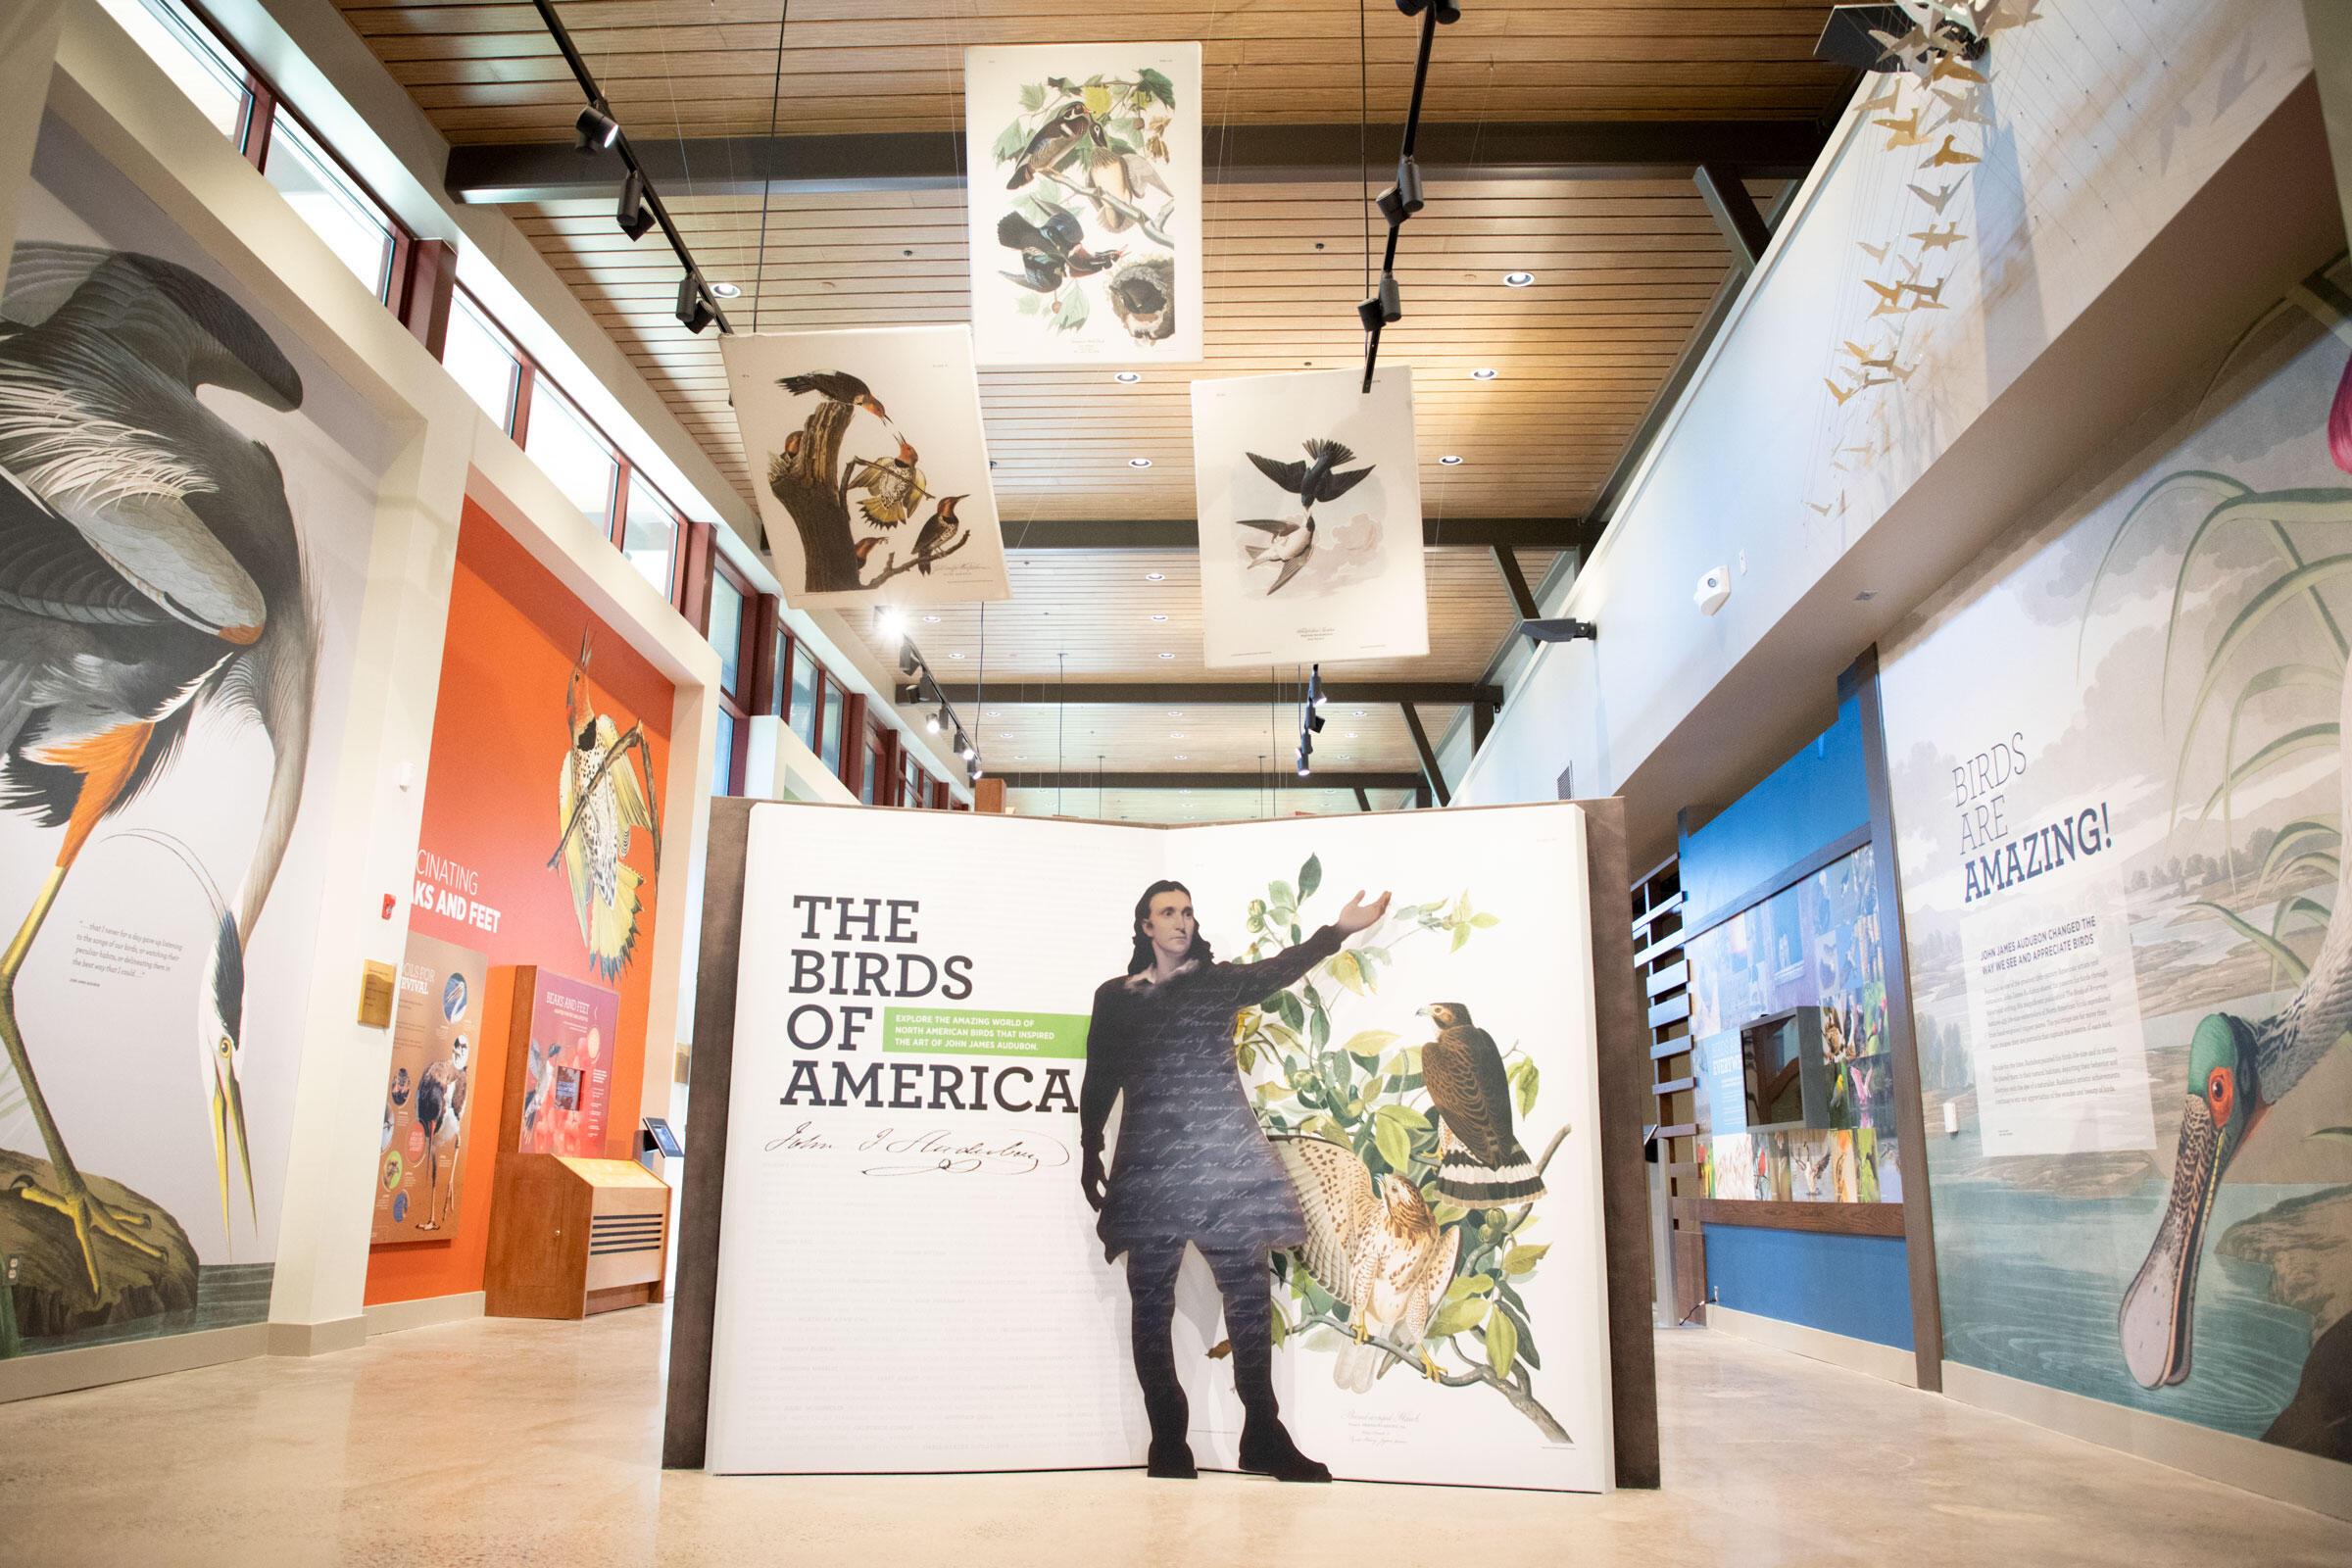 The entrance to the main exhibit hall of the new museum at the John James Audubon Center at Mill Grove on Tuesday, June 4, 2019 in Audubon, Pennsylvania. Luke Franke/Audubon